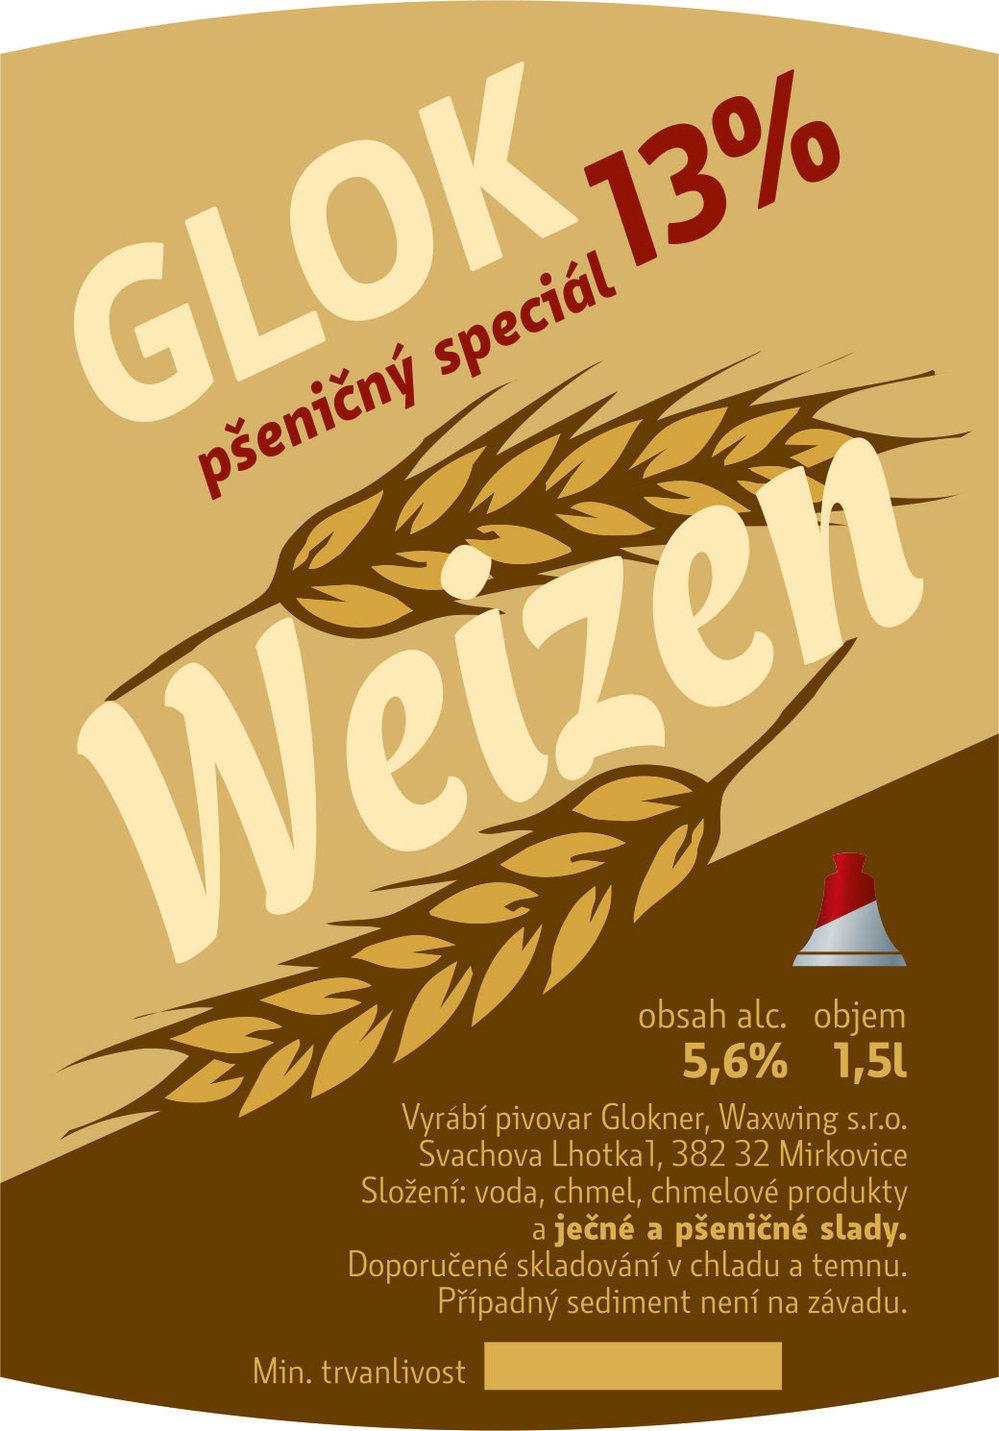 Glok 13 Weizen pšeničný speciál